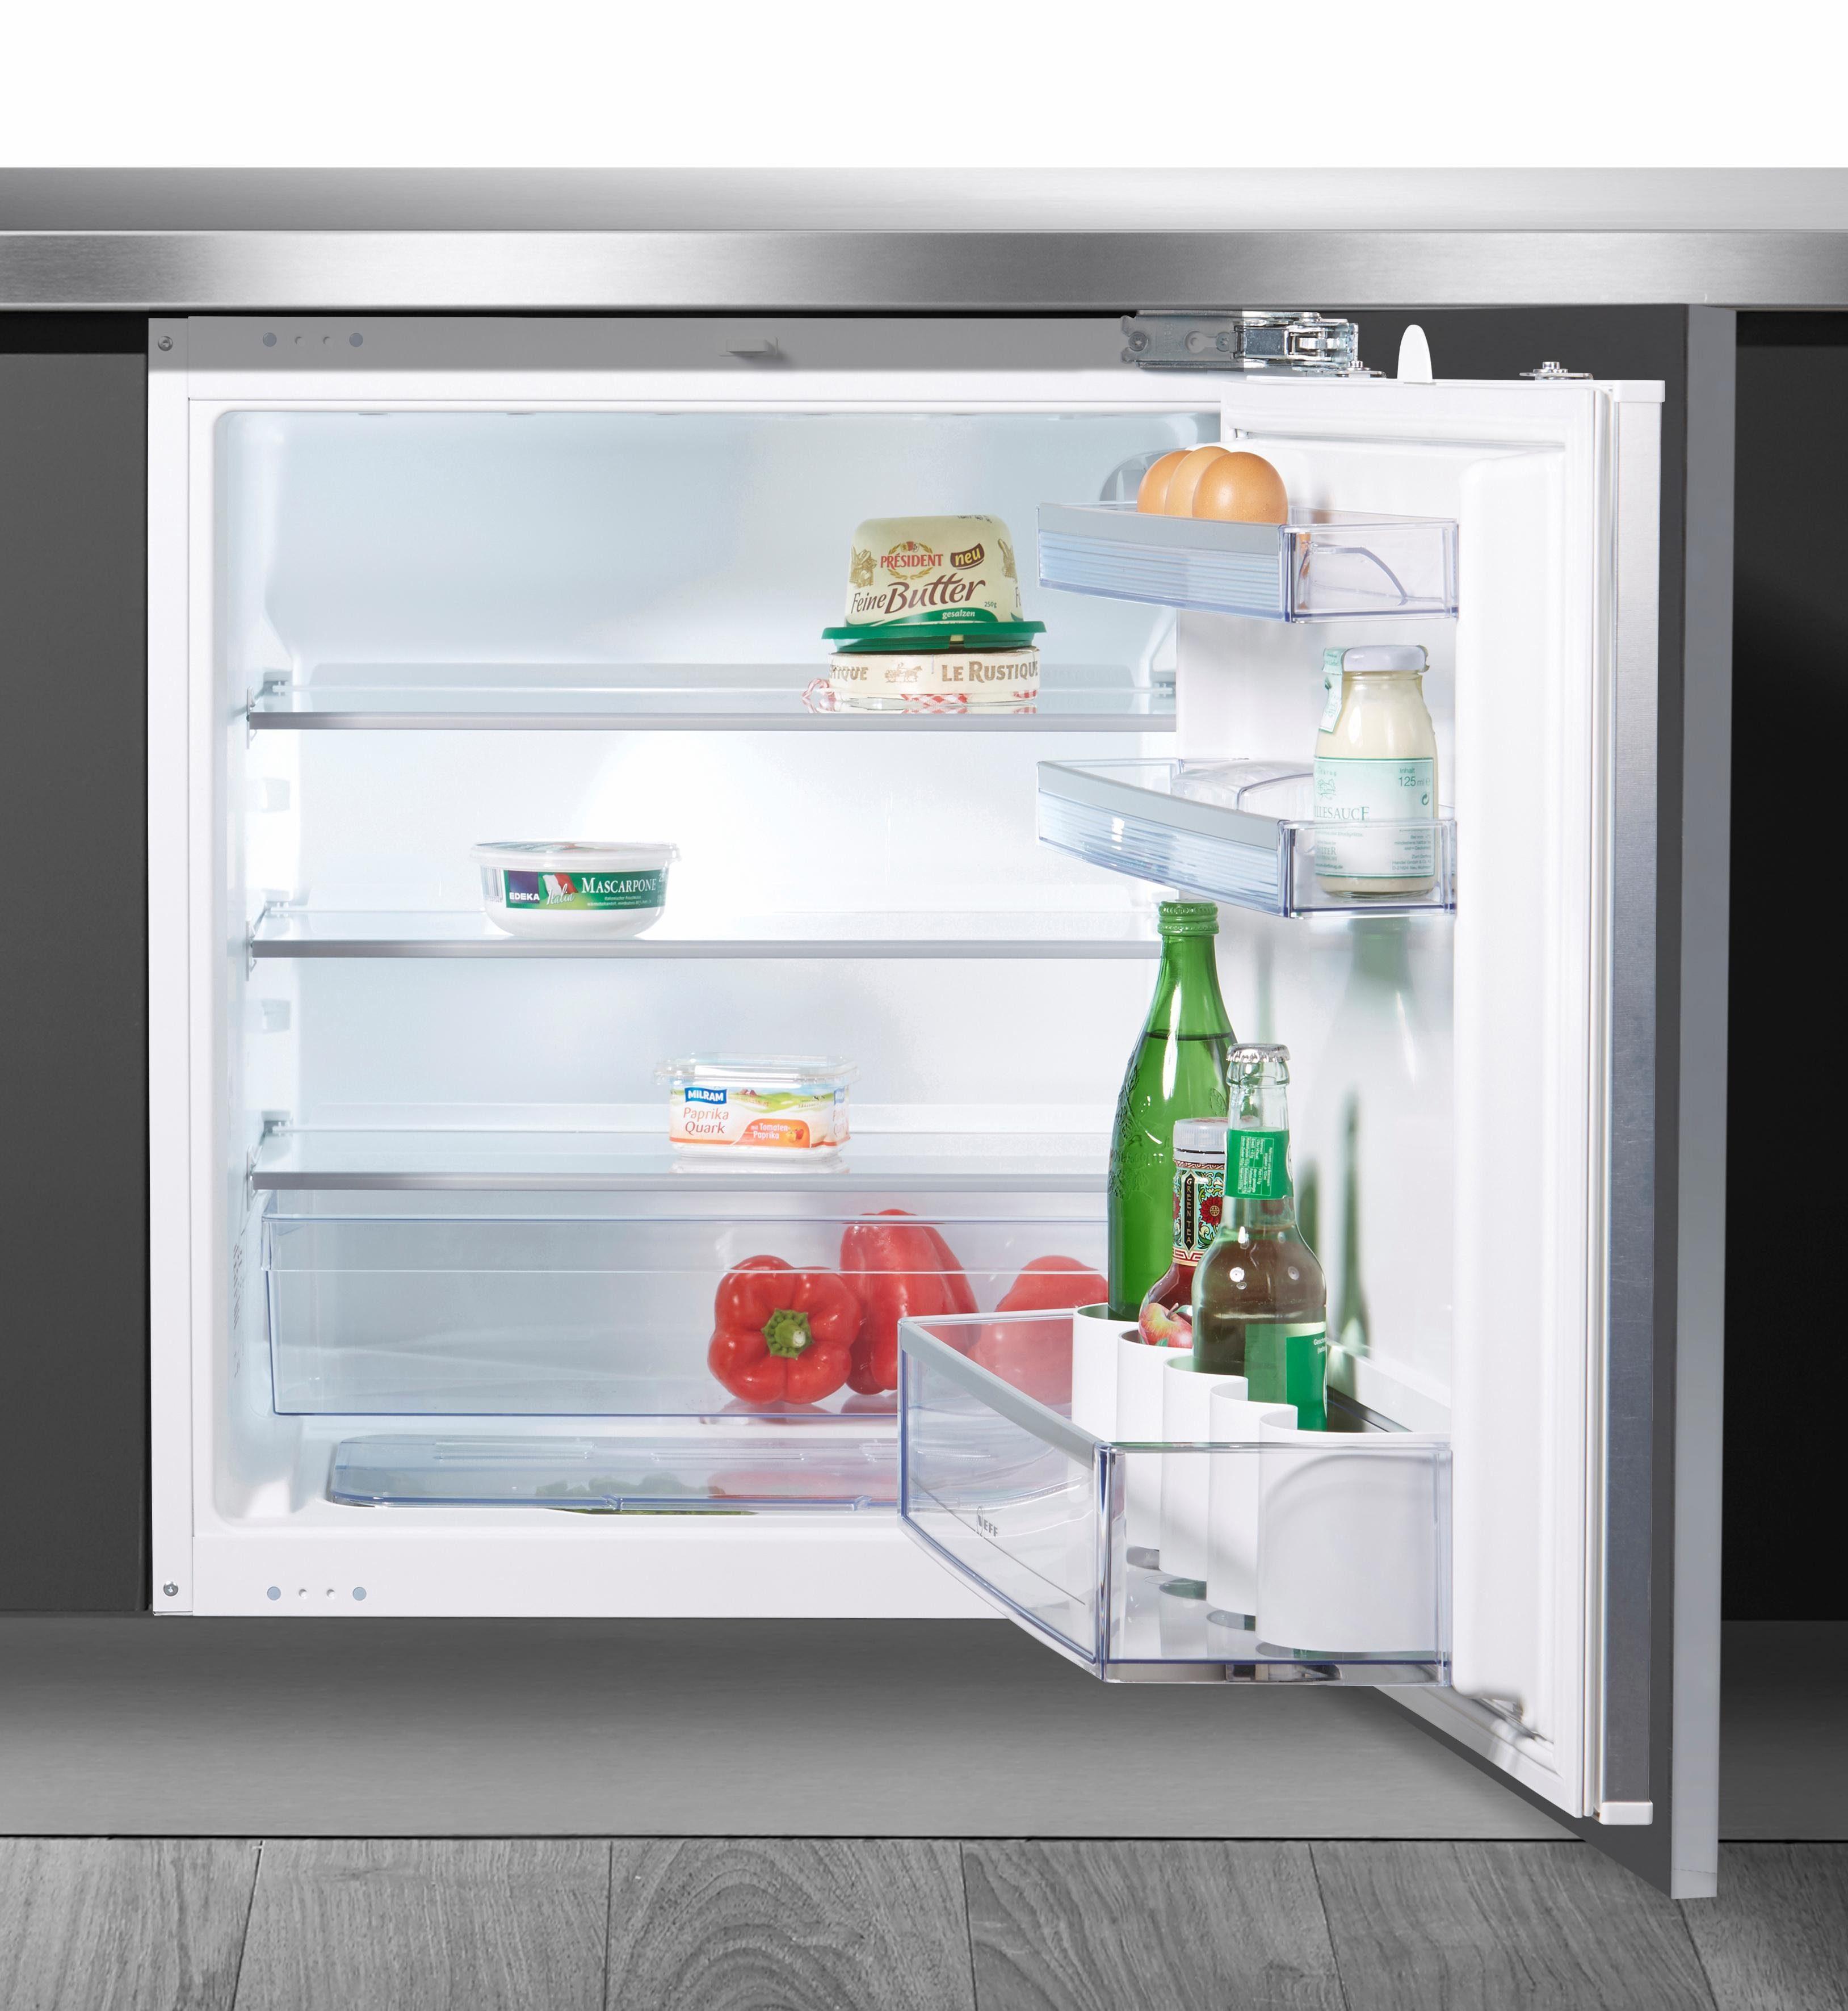 NEFF Einbaukühlschrank KU216A2 / K4316X8, 82,0 cm hoch, 59,8 cm breit, integrierbar